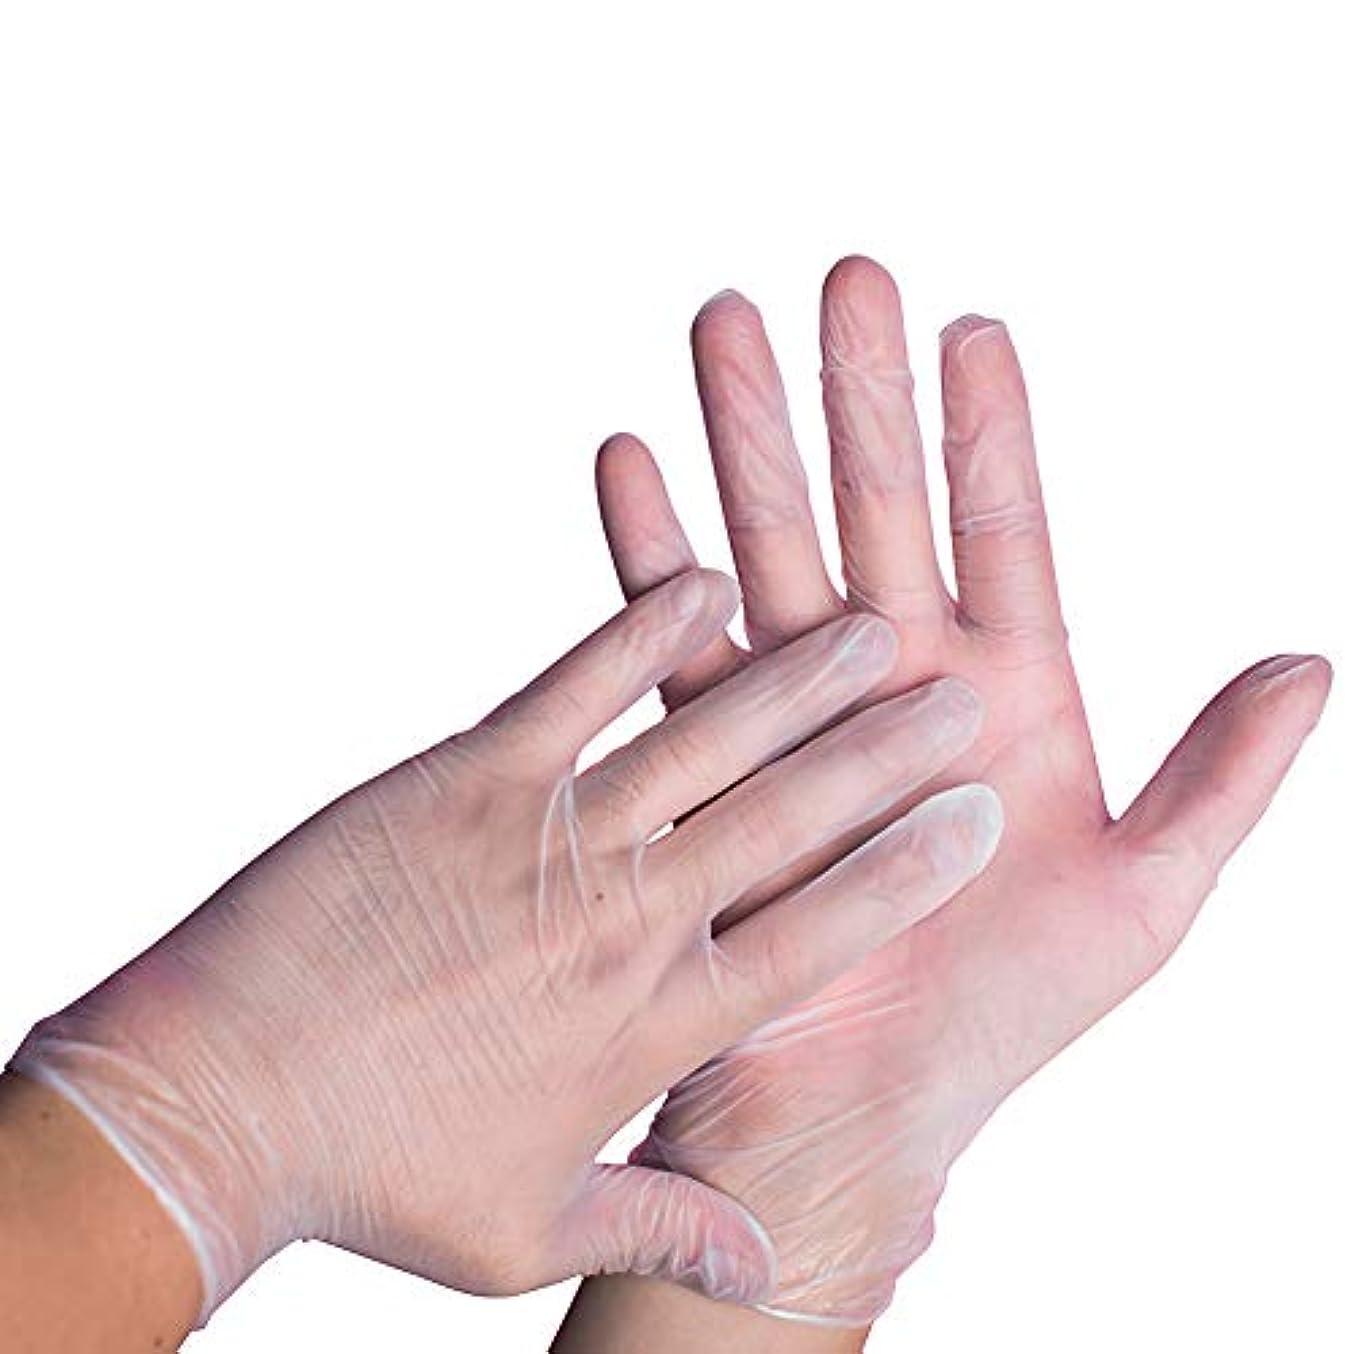 Luka 使い捨てPVC手袋 透明 粉フリー ビニール手袋 家庭用 検査用手袋